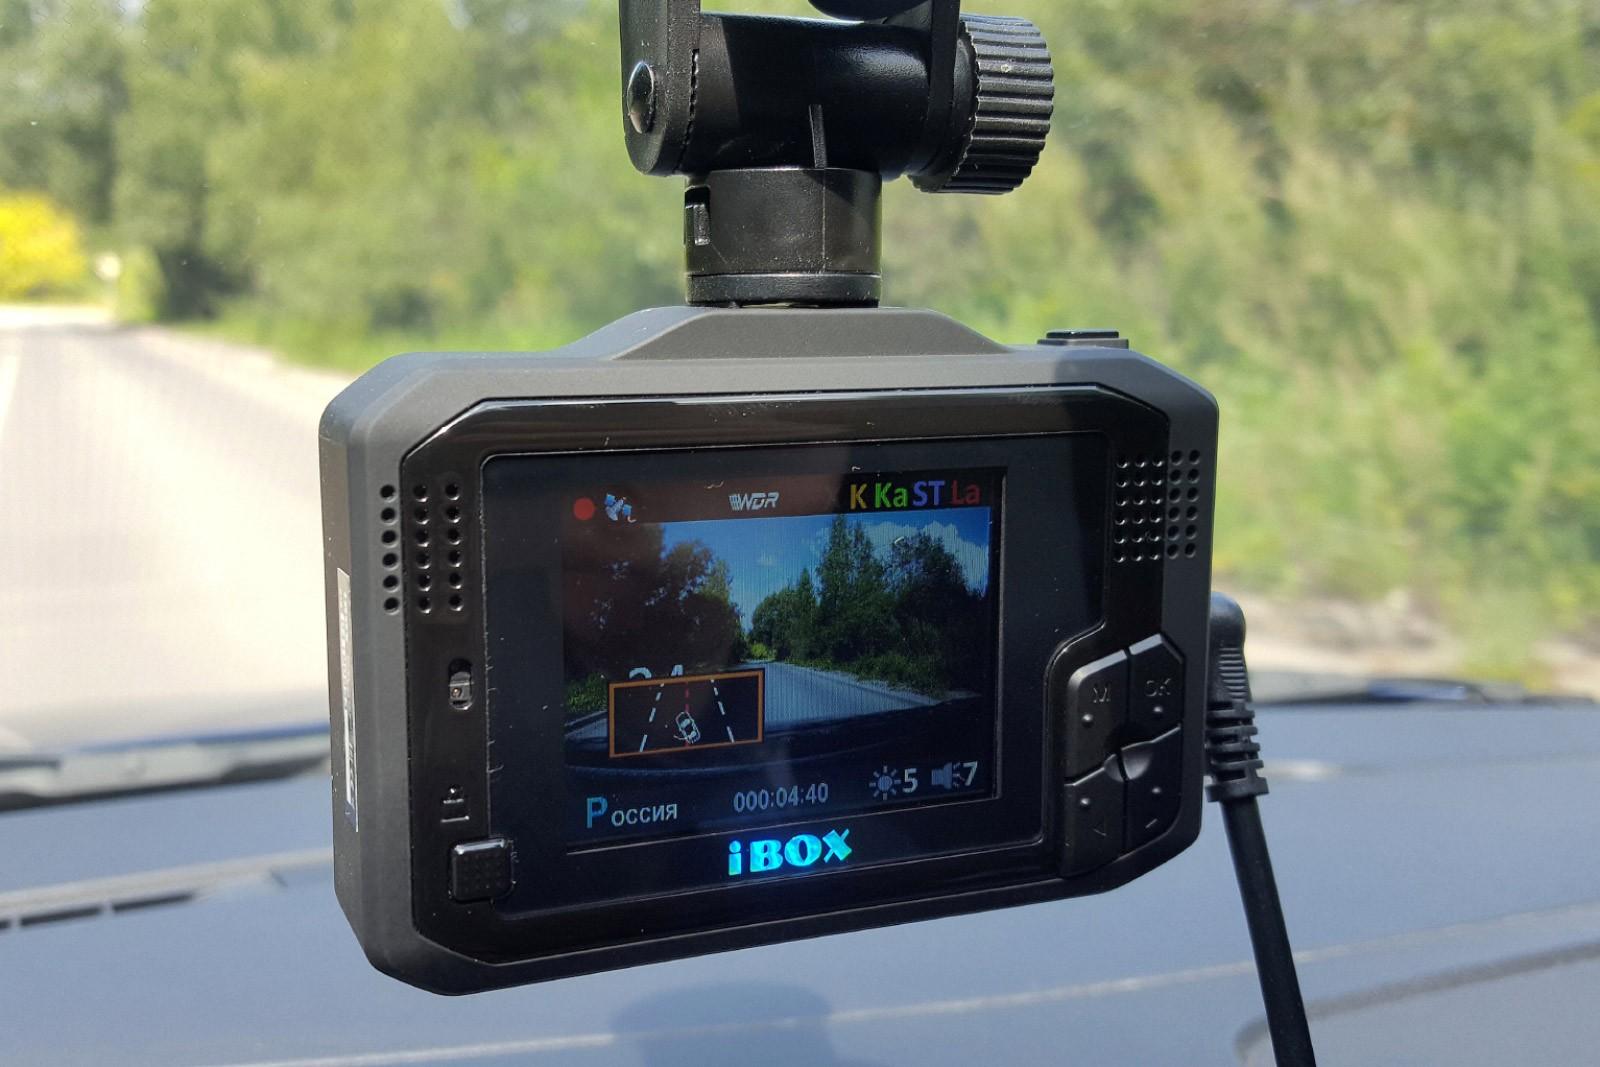 Комбо-устройство + смартфон = ? Обзор радар-детектора/видеорегистратора iBOX F5 WiFi SIGNATURE A12